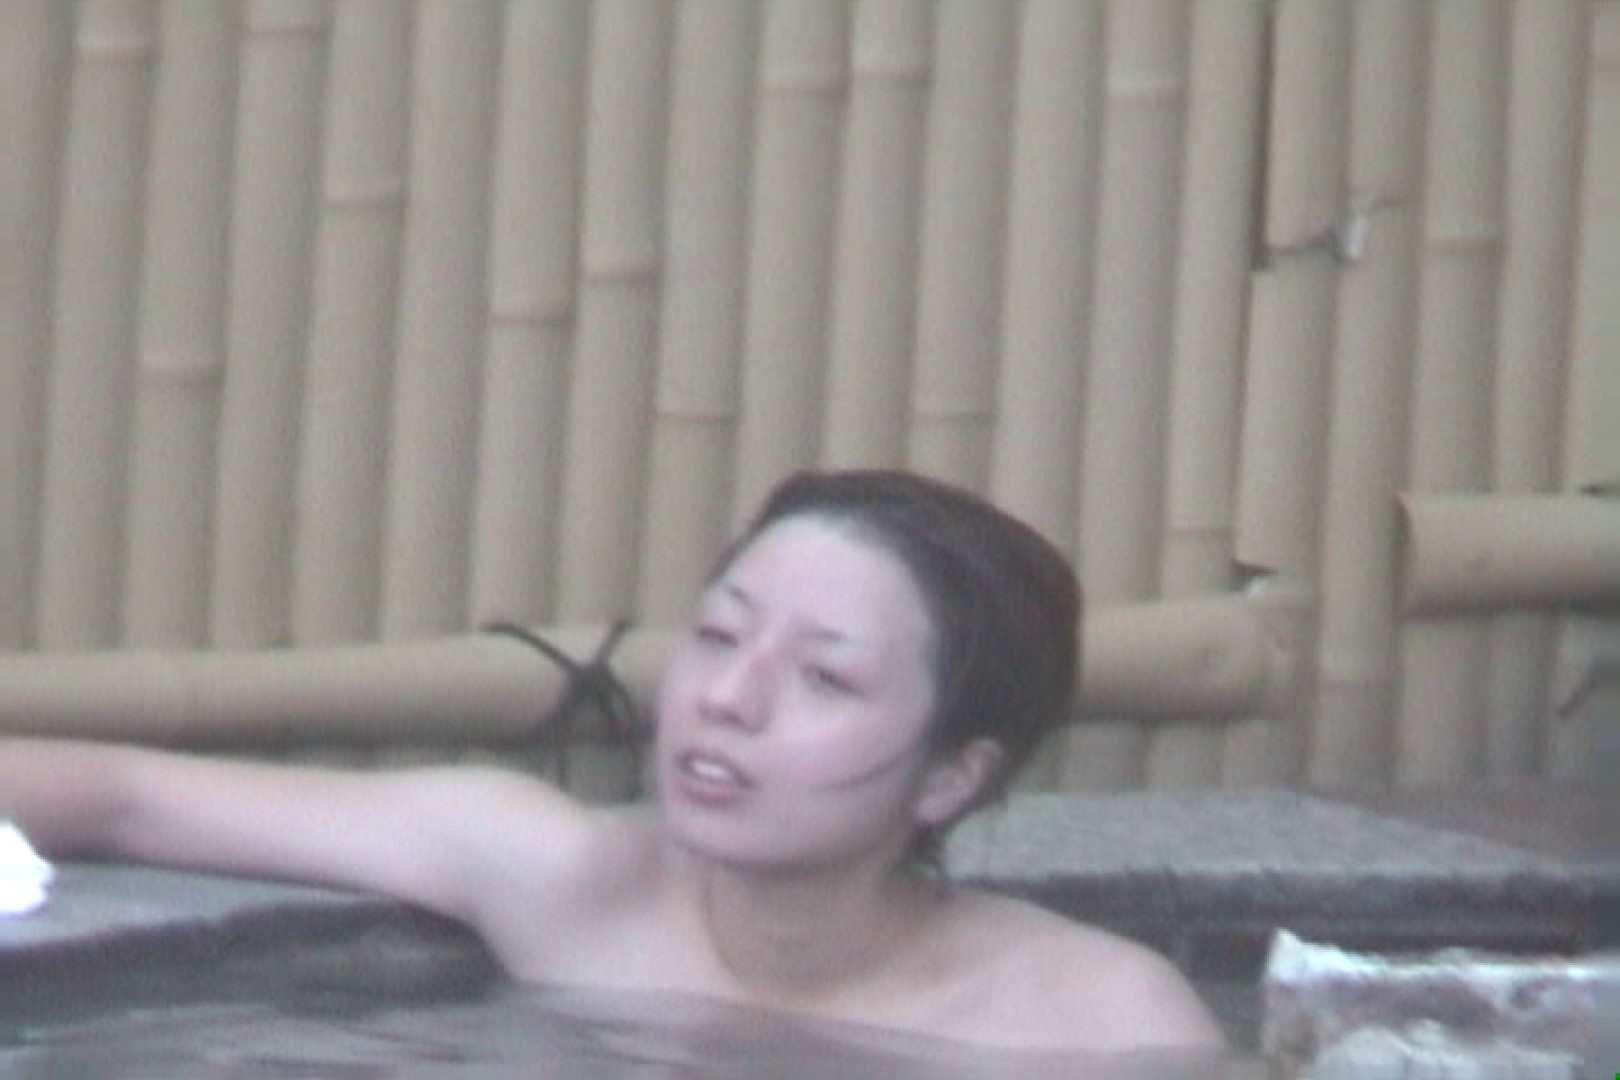 Aquaな露天風呂Vol.608 HなOL | 盗撮  89pic 58